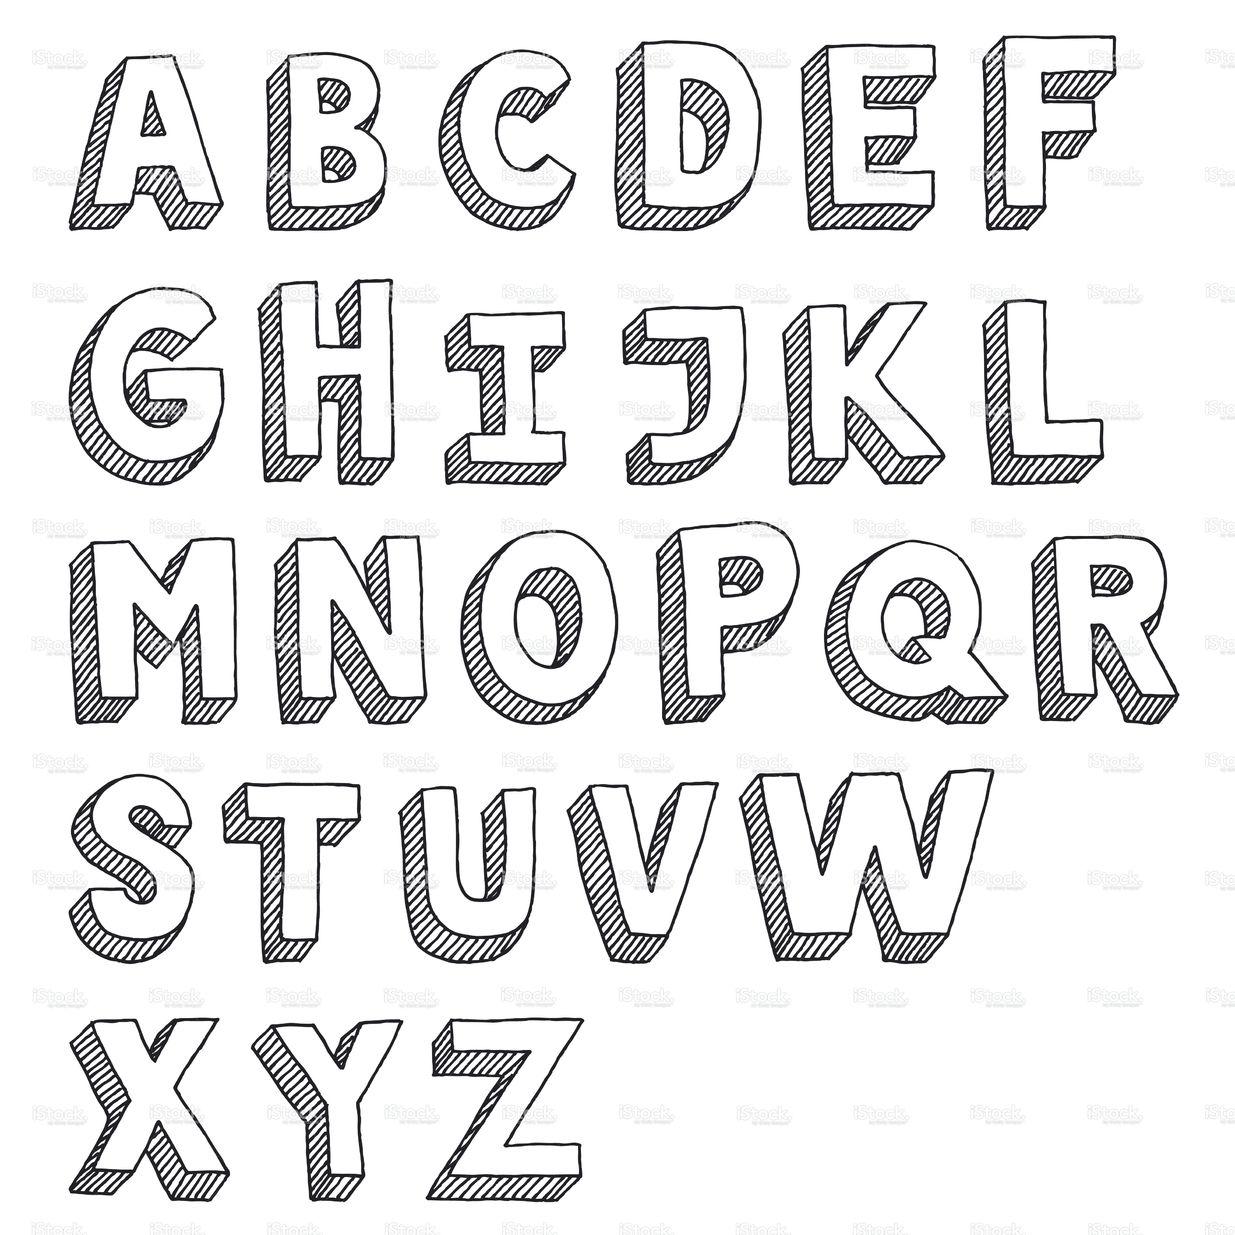 Hand-drawn vector drawing of an Sans Serif Alphabet